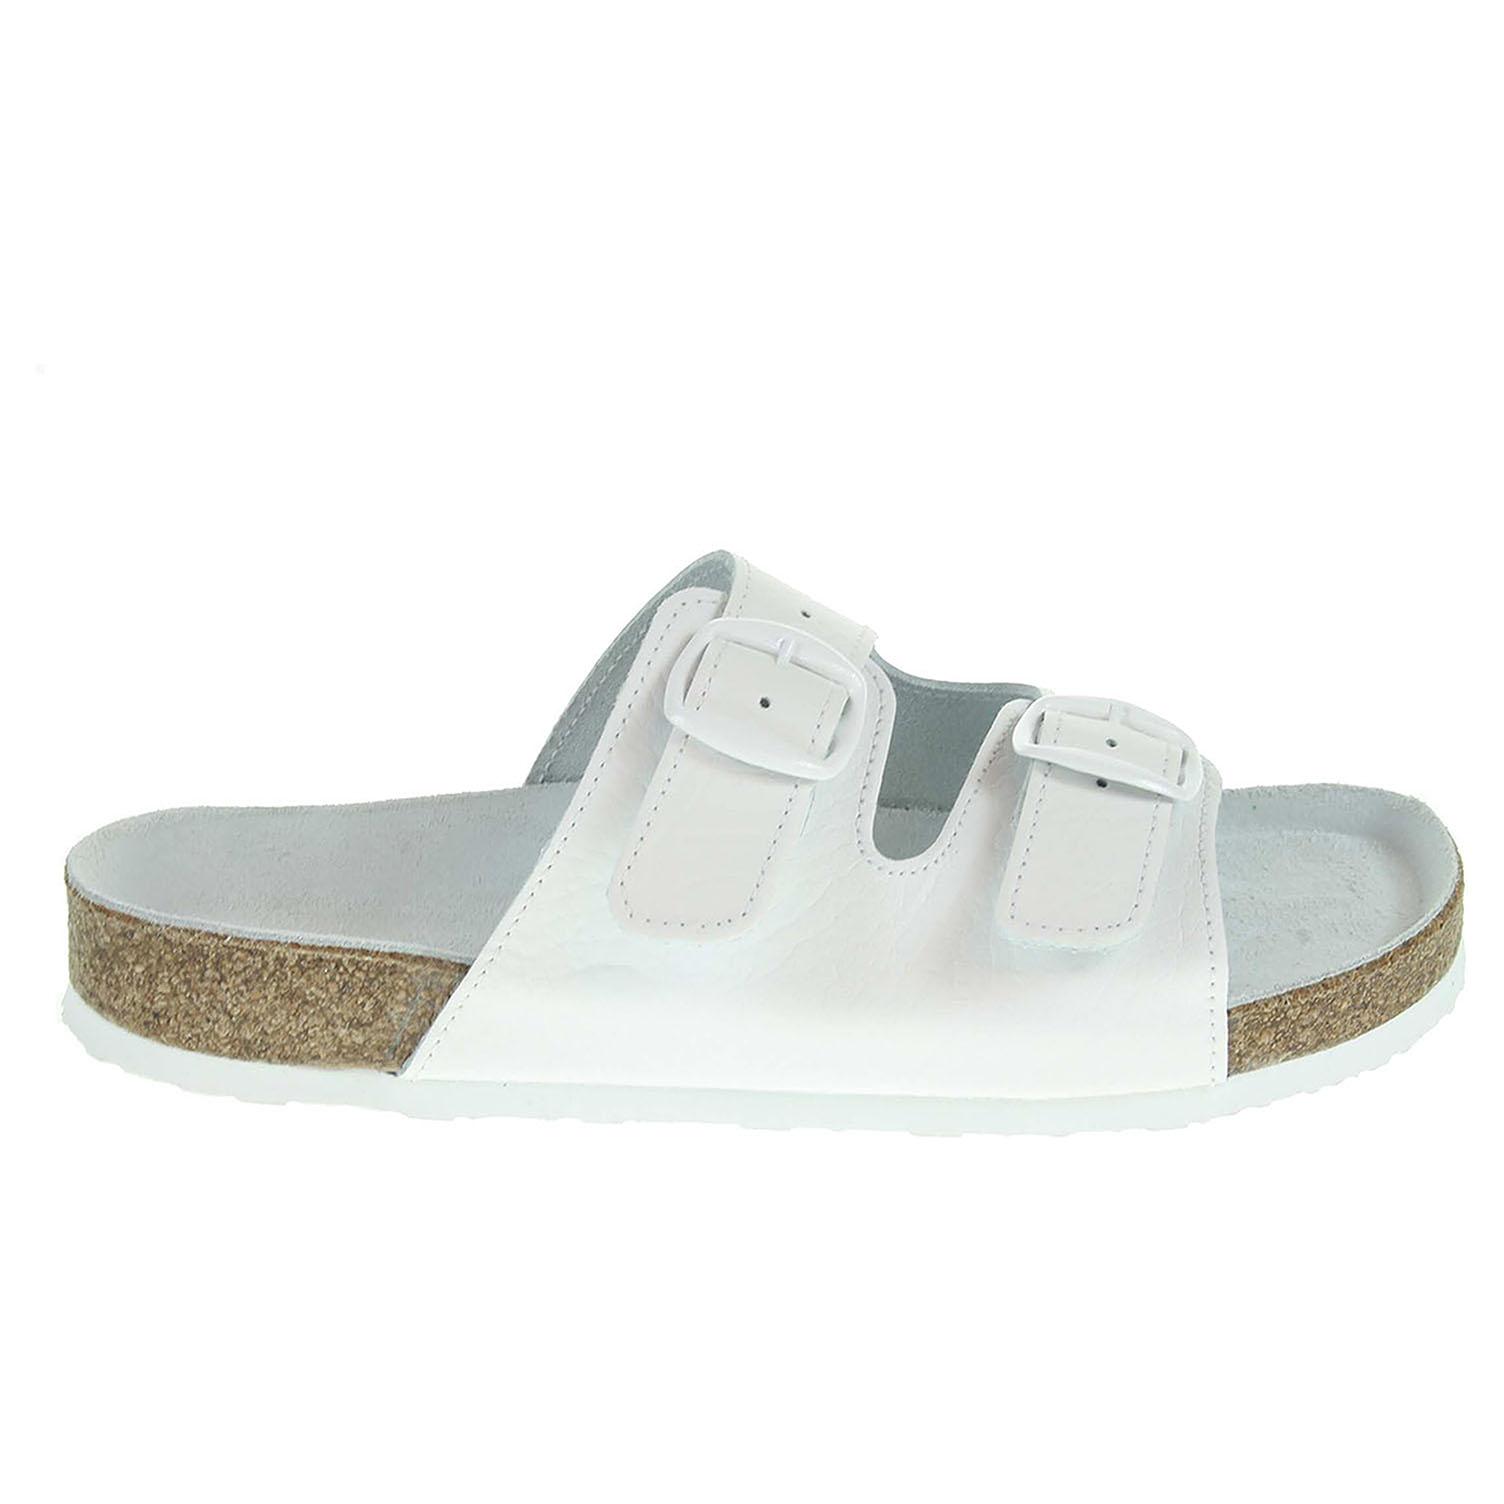 Ecco Pegres dámské pantofle 2100.00 bílé 23400284